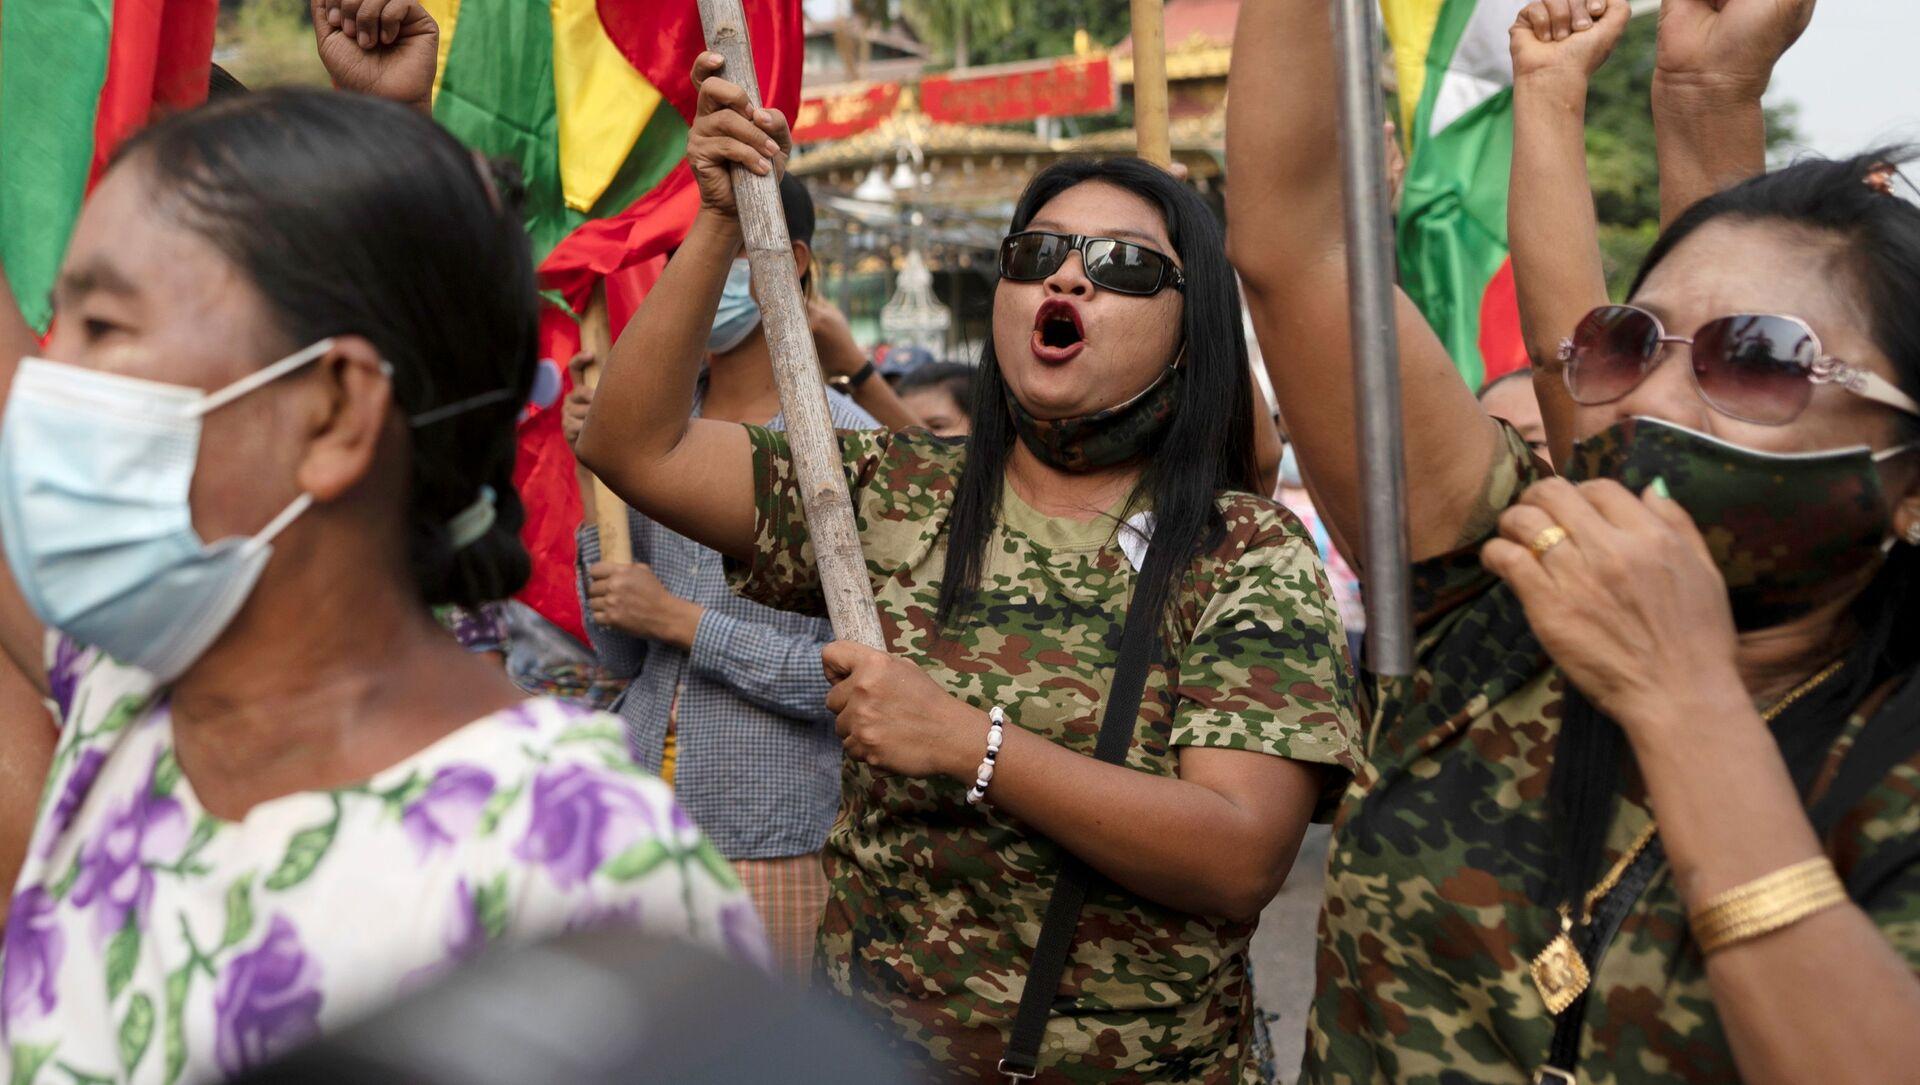 Golpe in Myanmar: militari sono sempre stati una minaccia dal 2011, dice ricercatore - Sputnik Italia, 1920, 01.02.2021